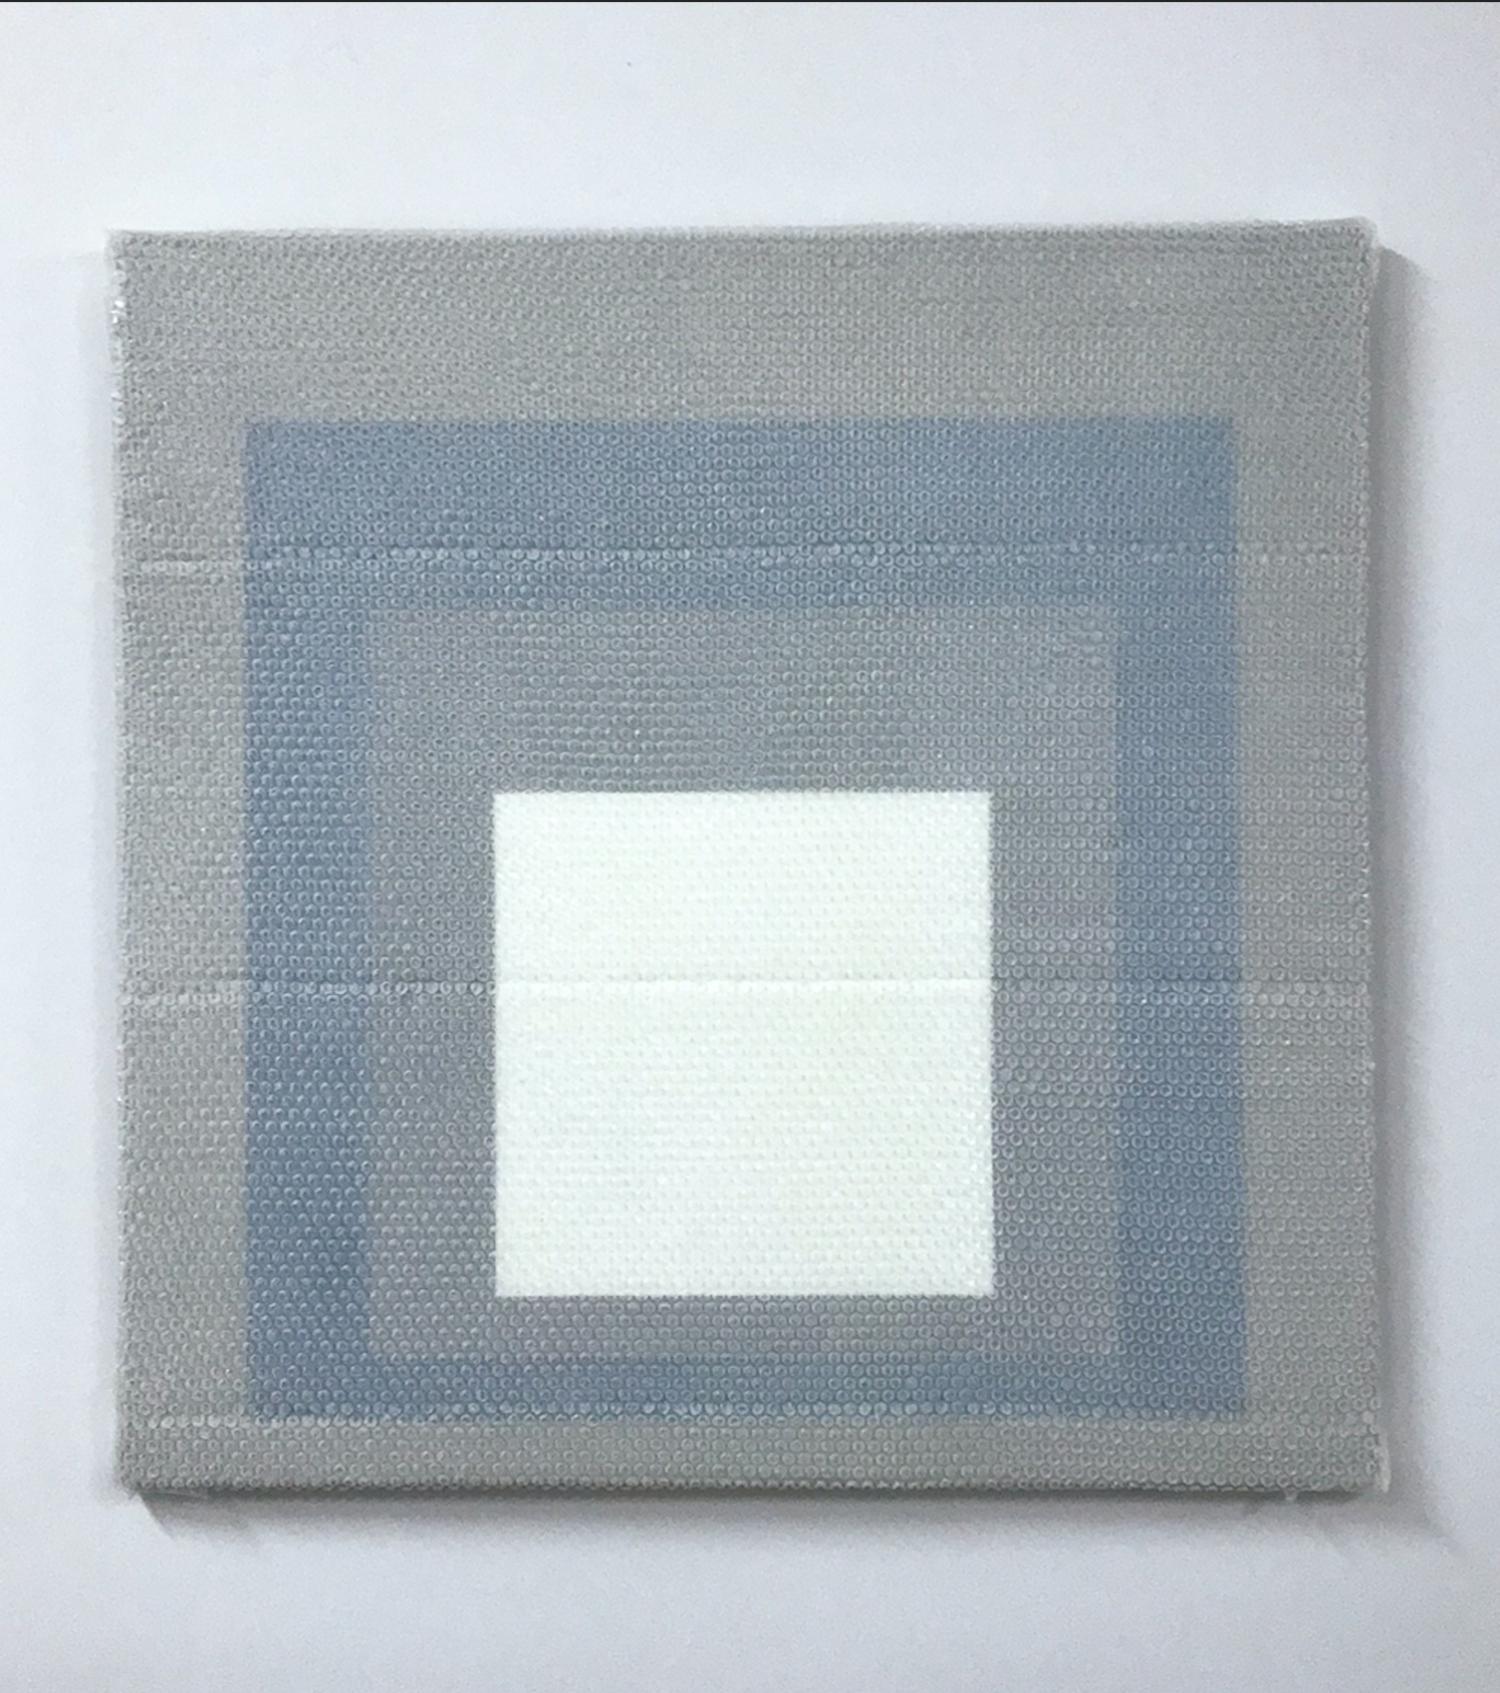 "Homage to the square #5,  2018,  Acrylique sur toile 36"" X 36""."